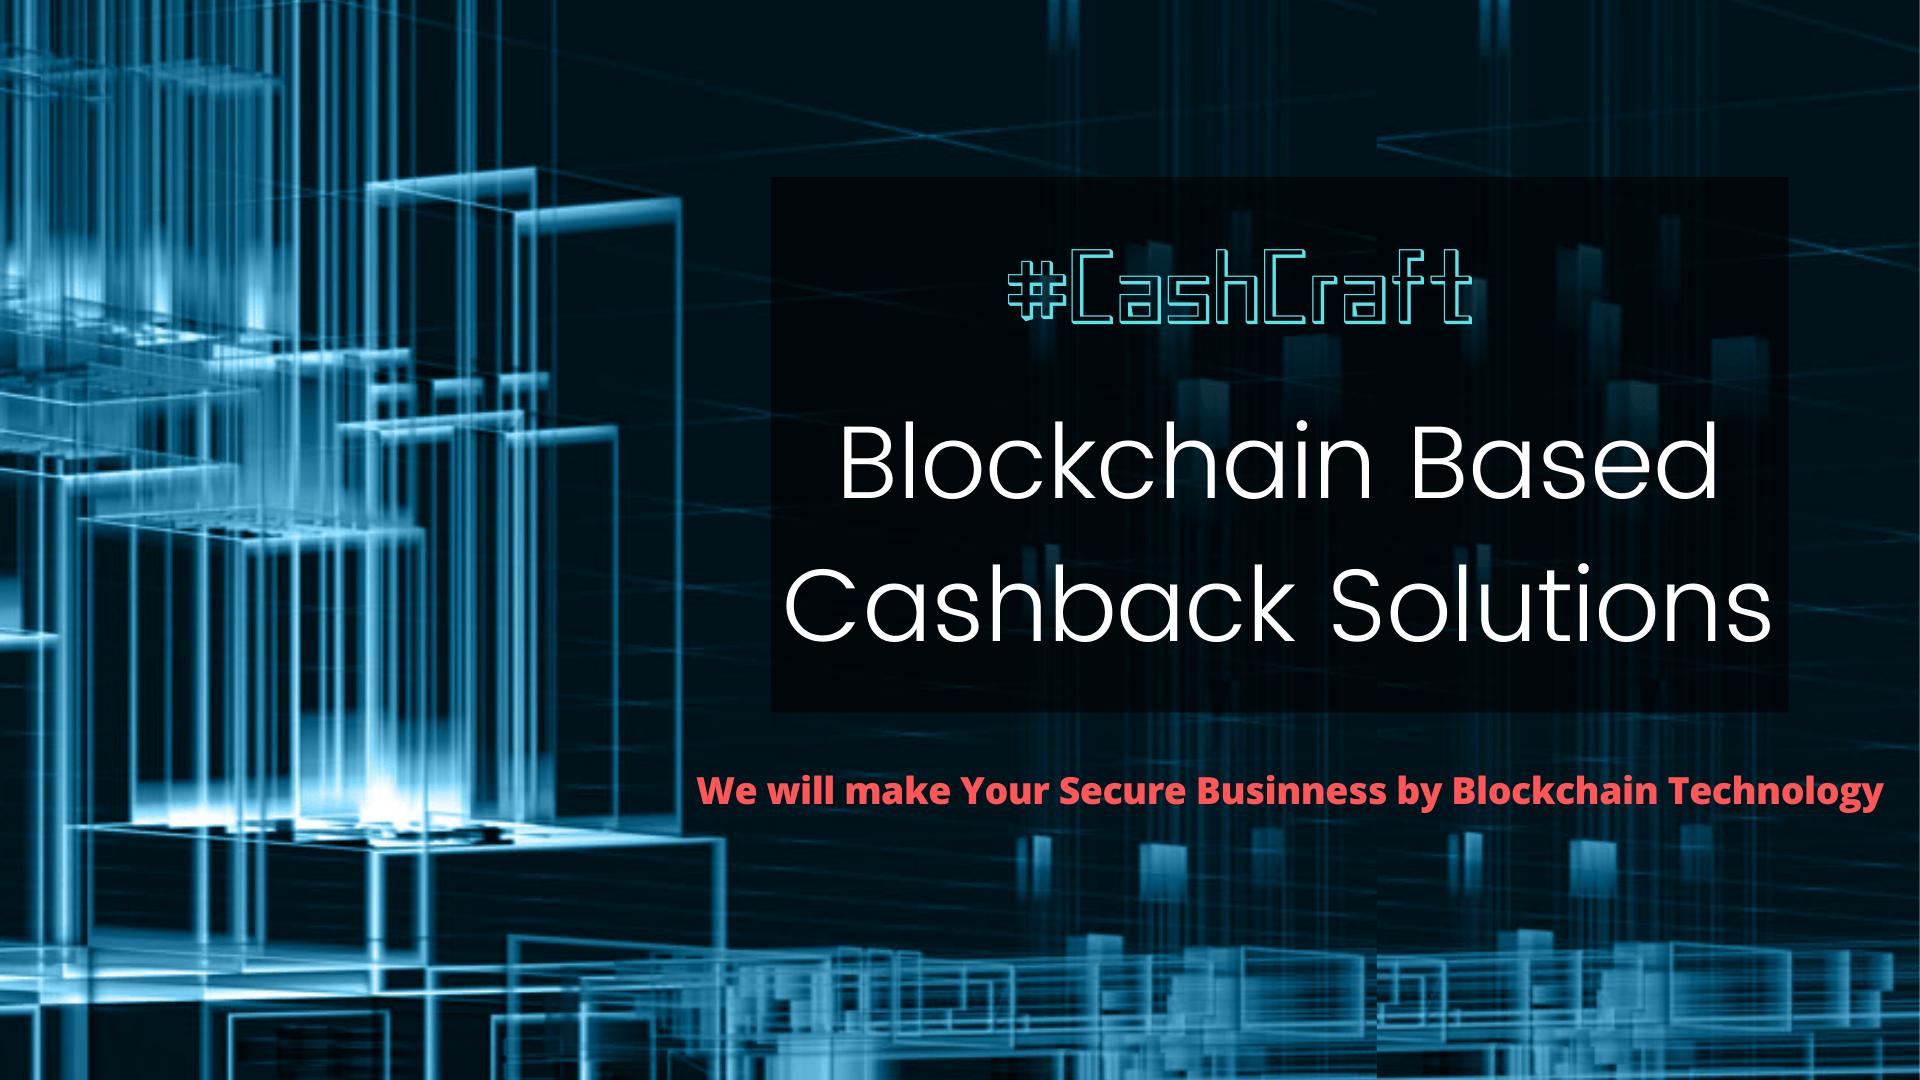 Blockchain Cashback Solutions: Develop your Cashback Website on Decentralized Network